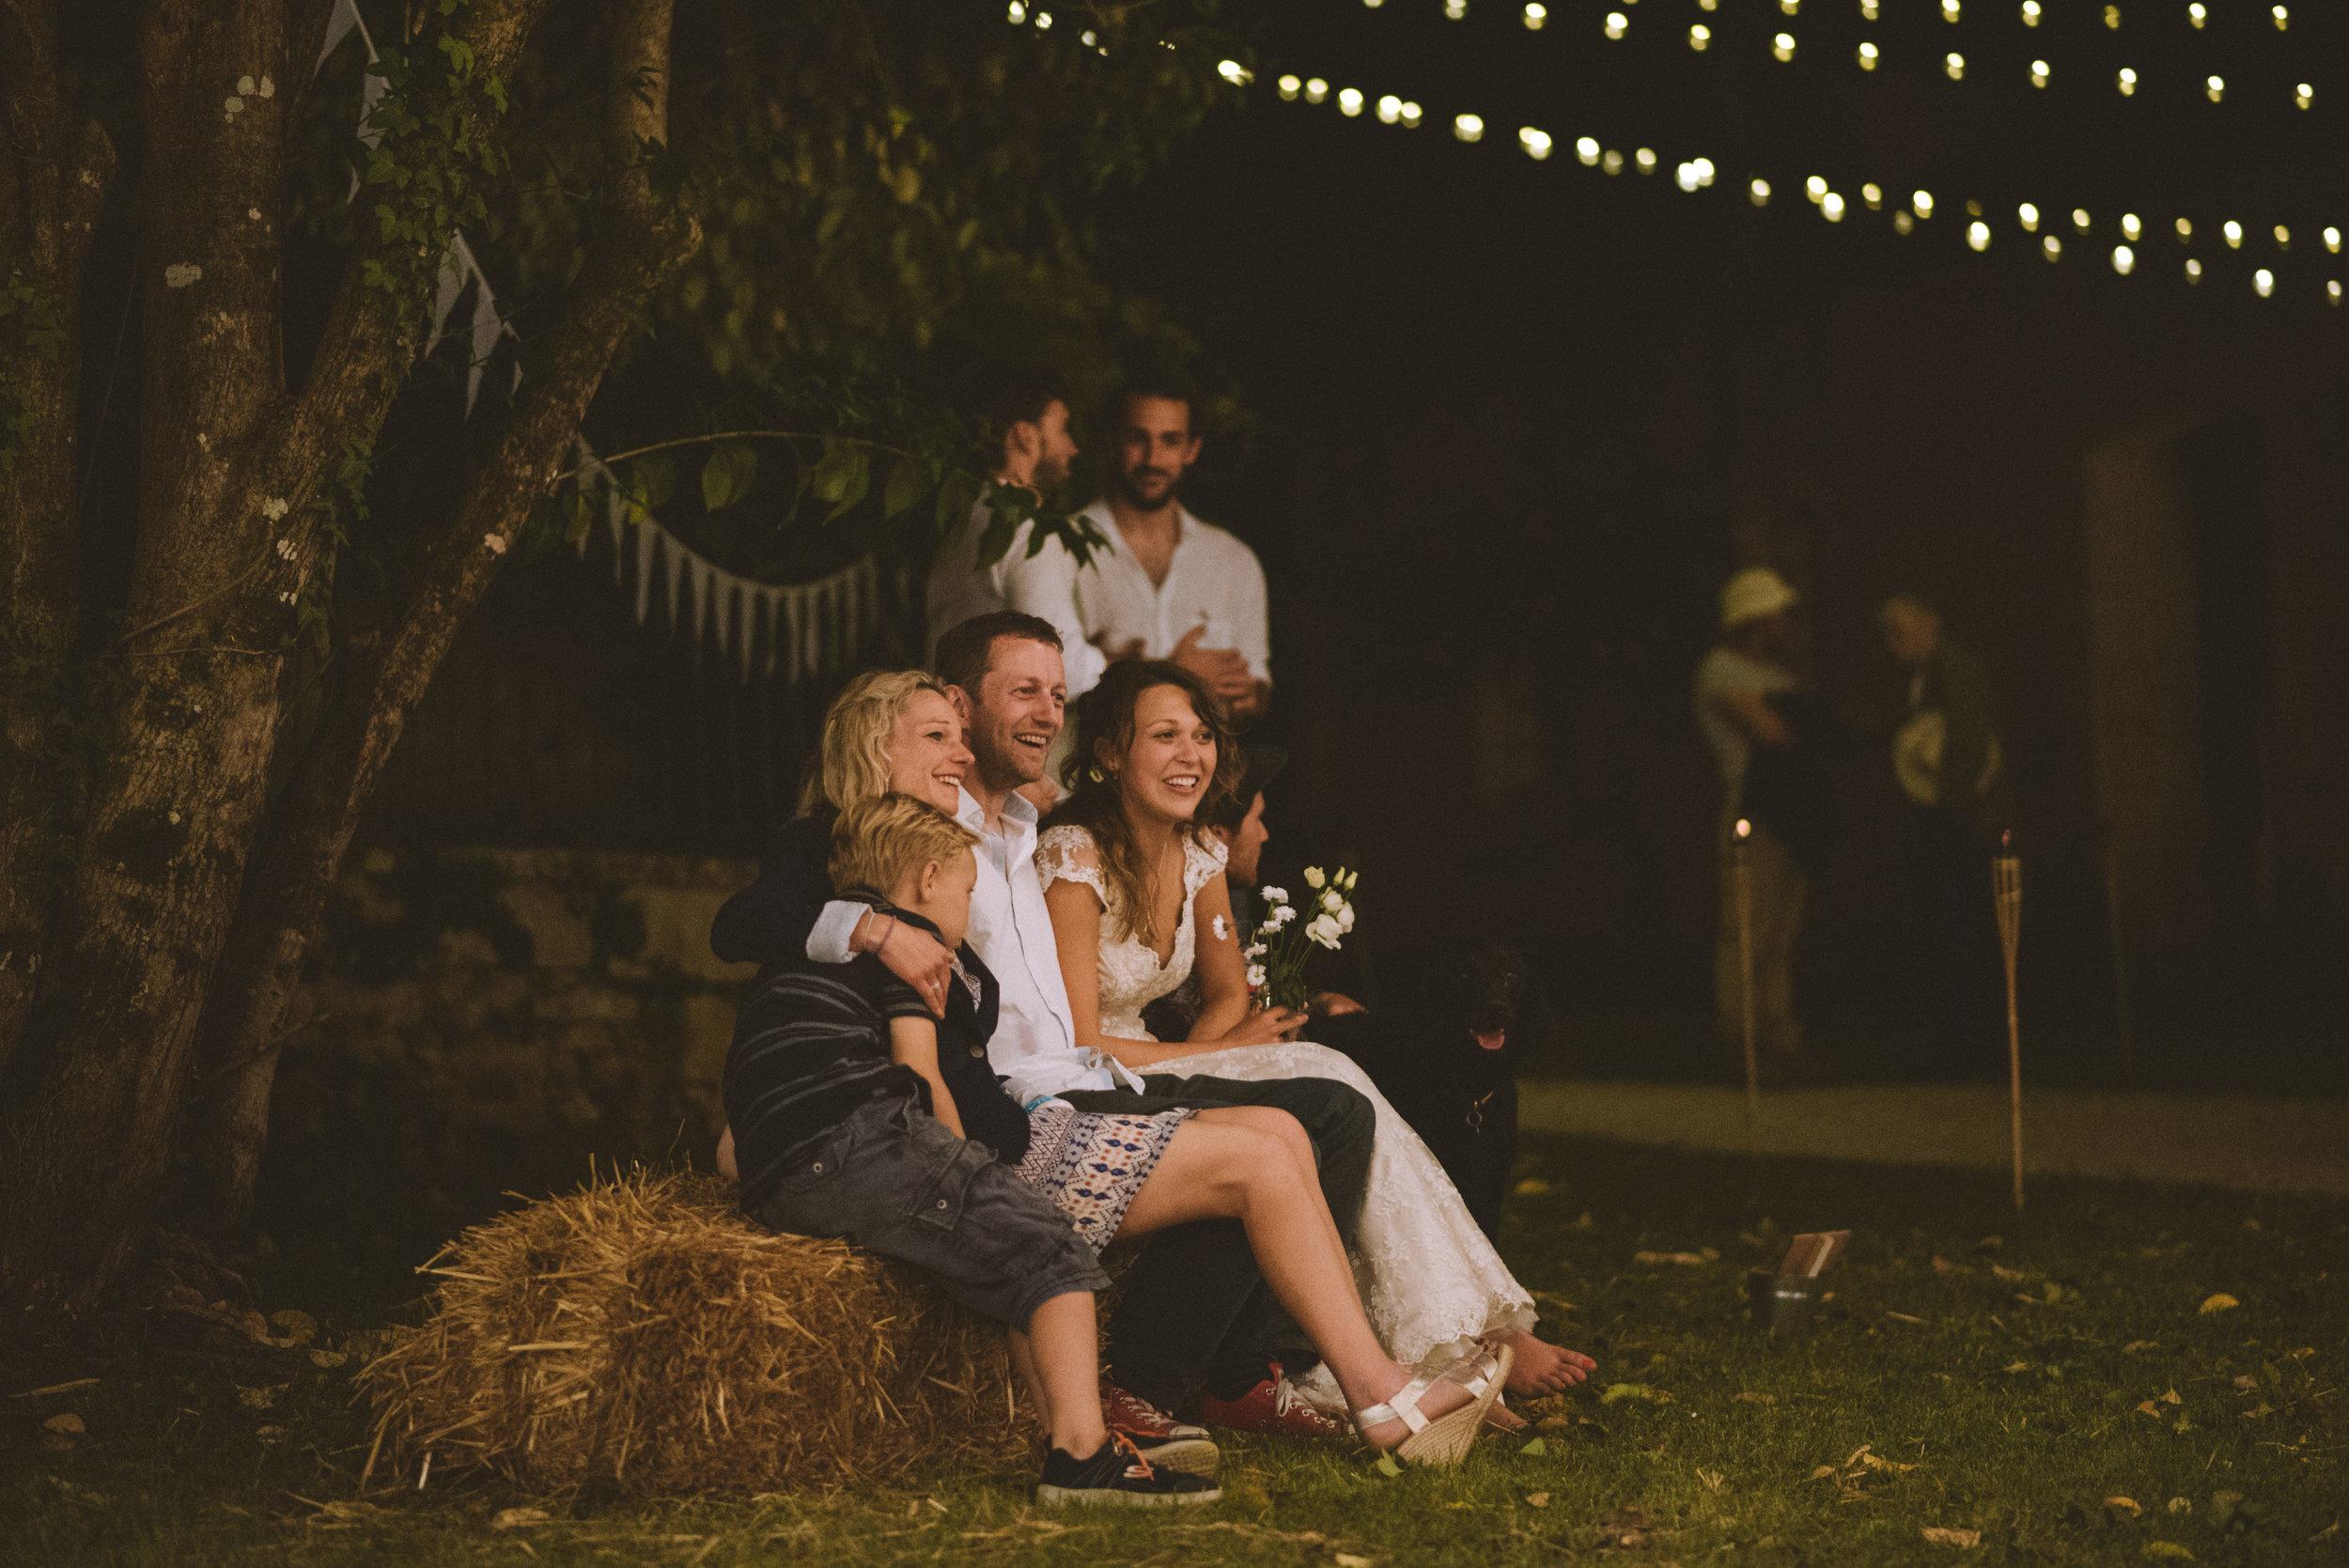 wedding-photographer-dordogne-mark-shaw-86.jpg